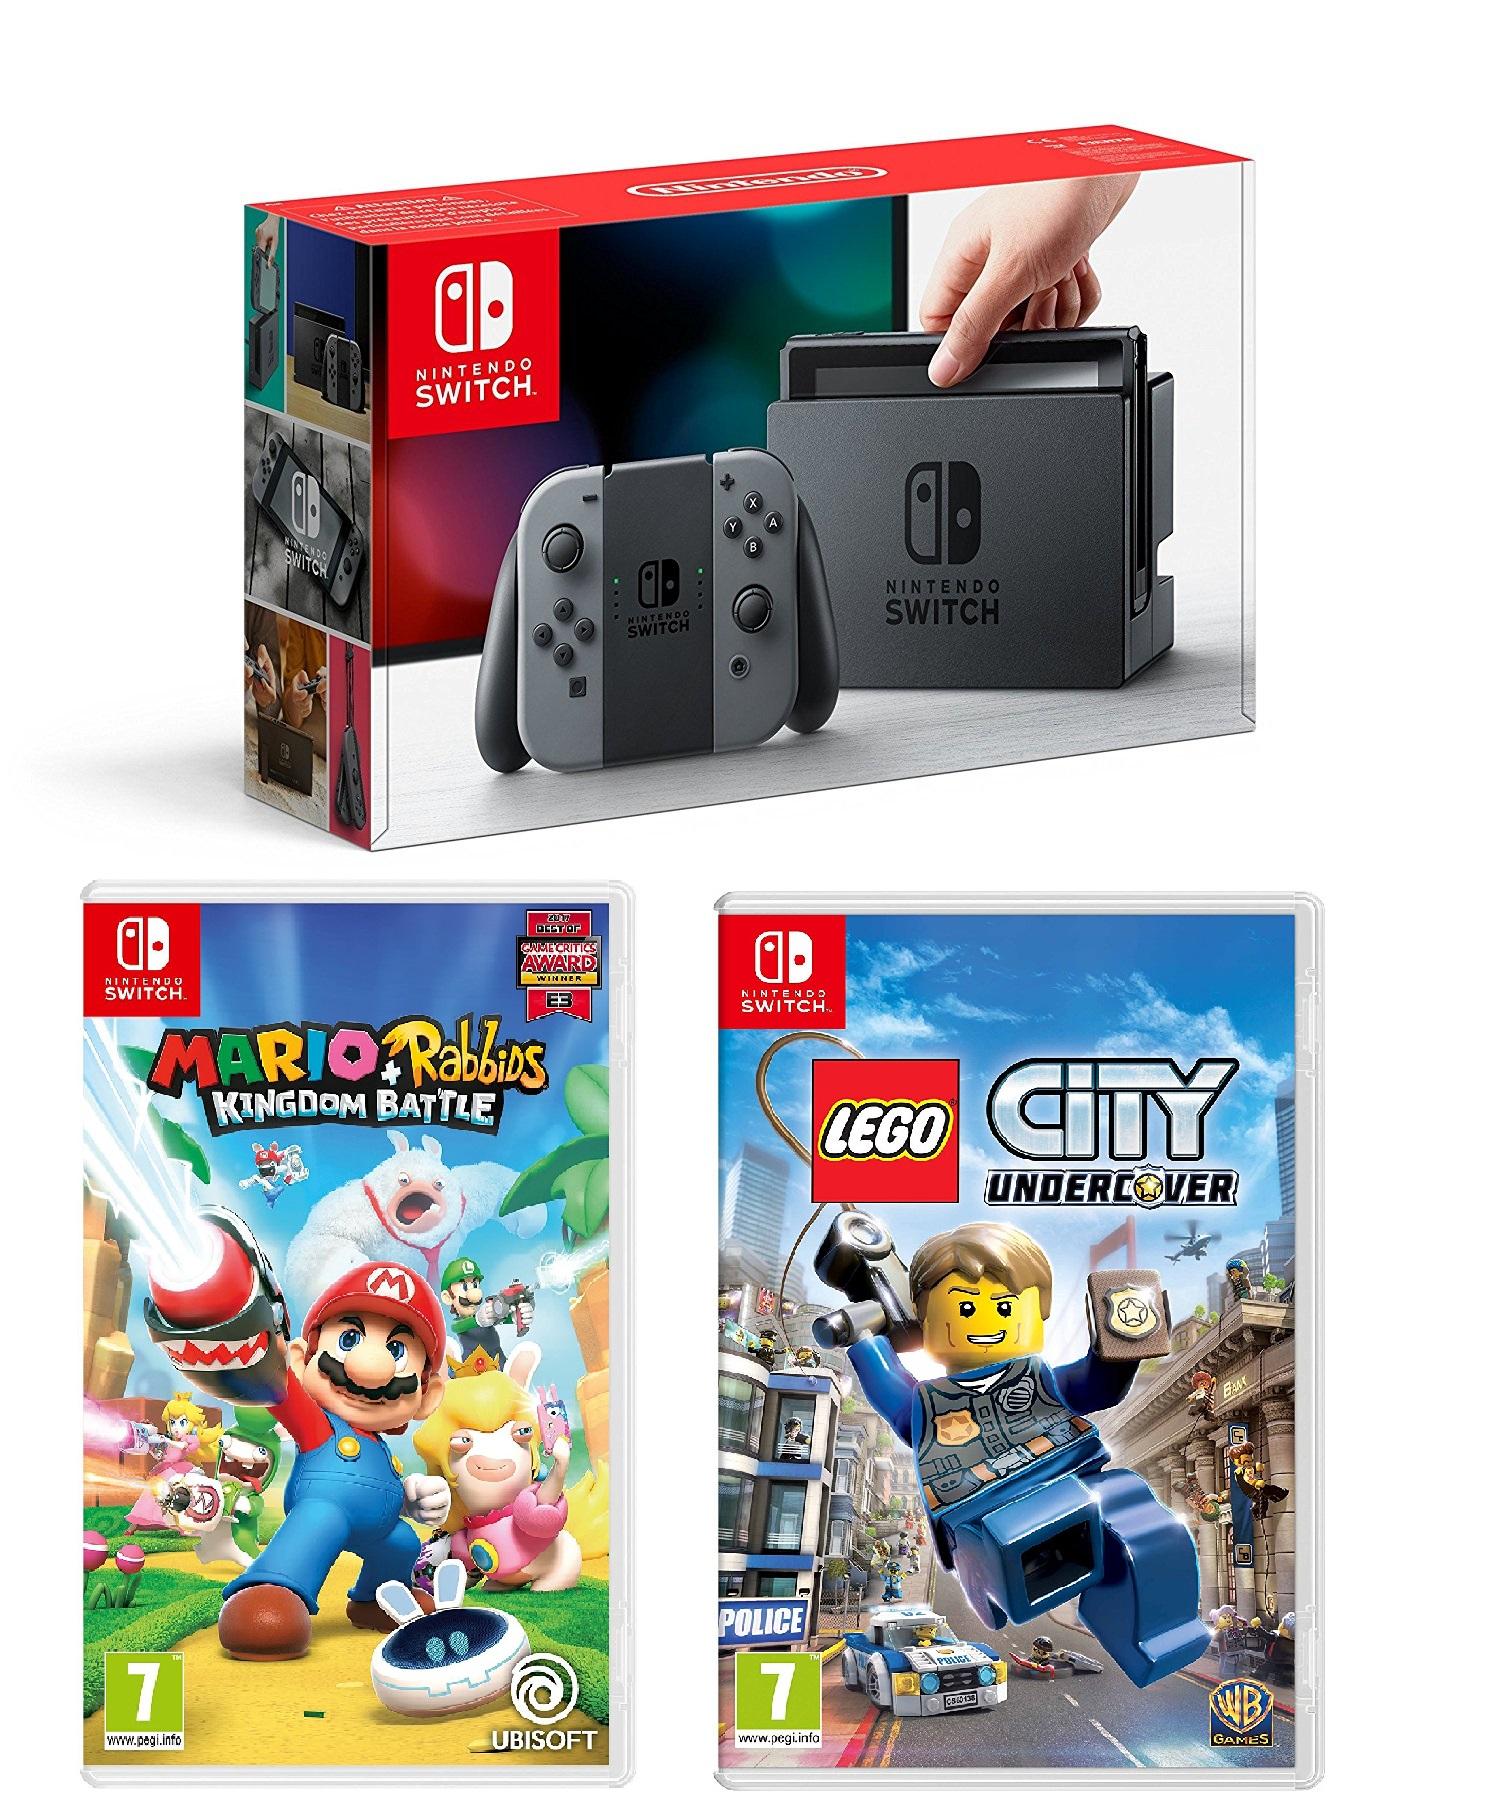 Nintendo Switch console Grey + Mario Rabbids Kingdom Battle + Lego City Undercover £299.99 @ Tesco Direct